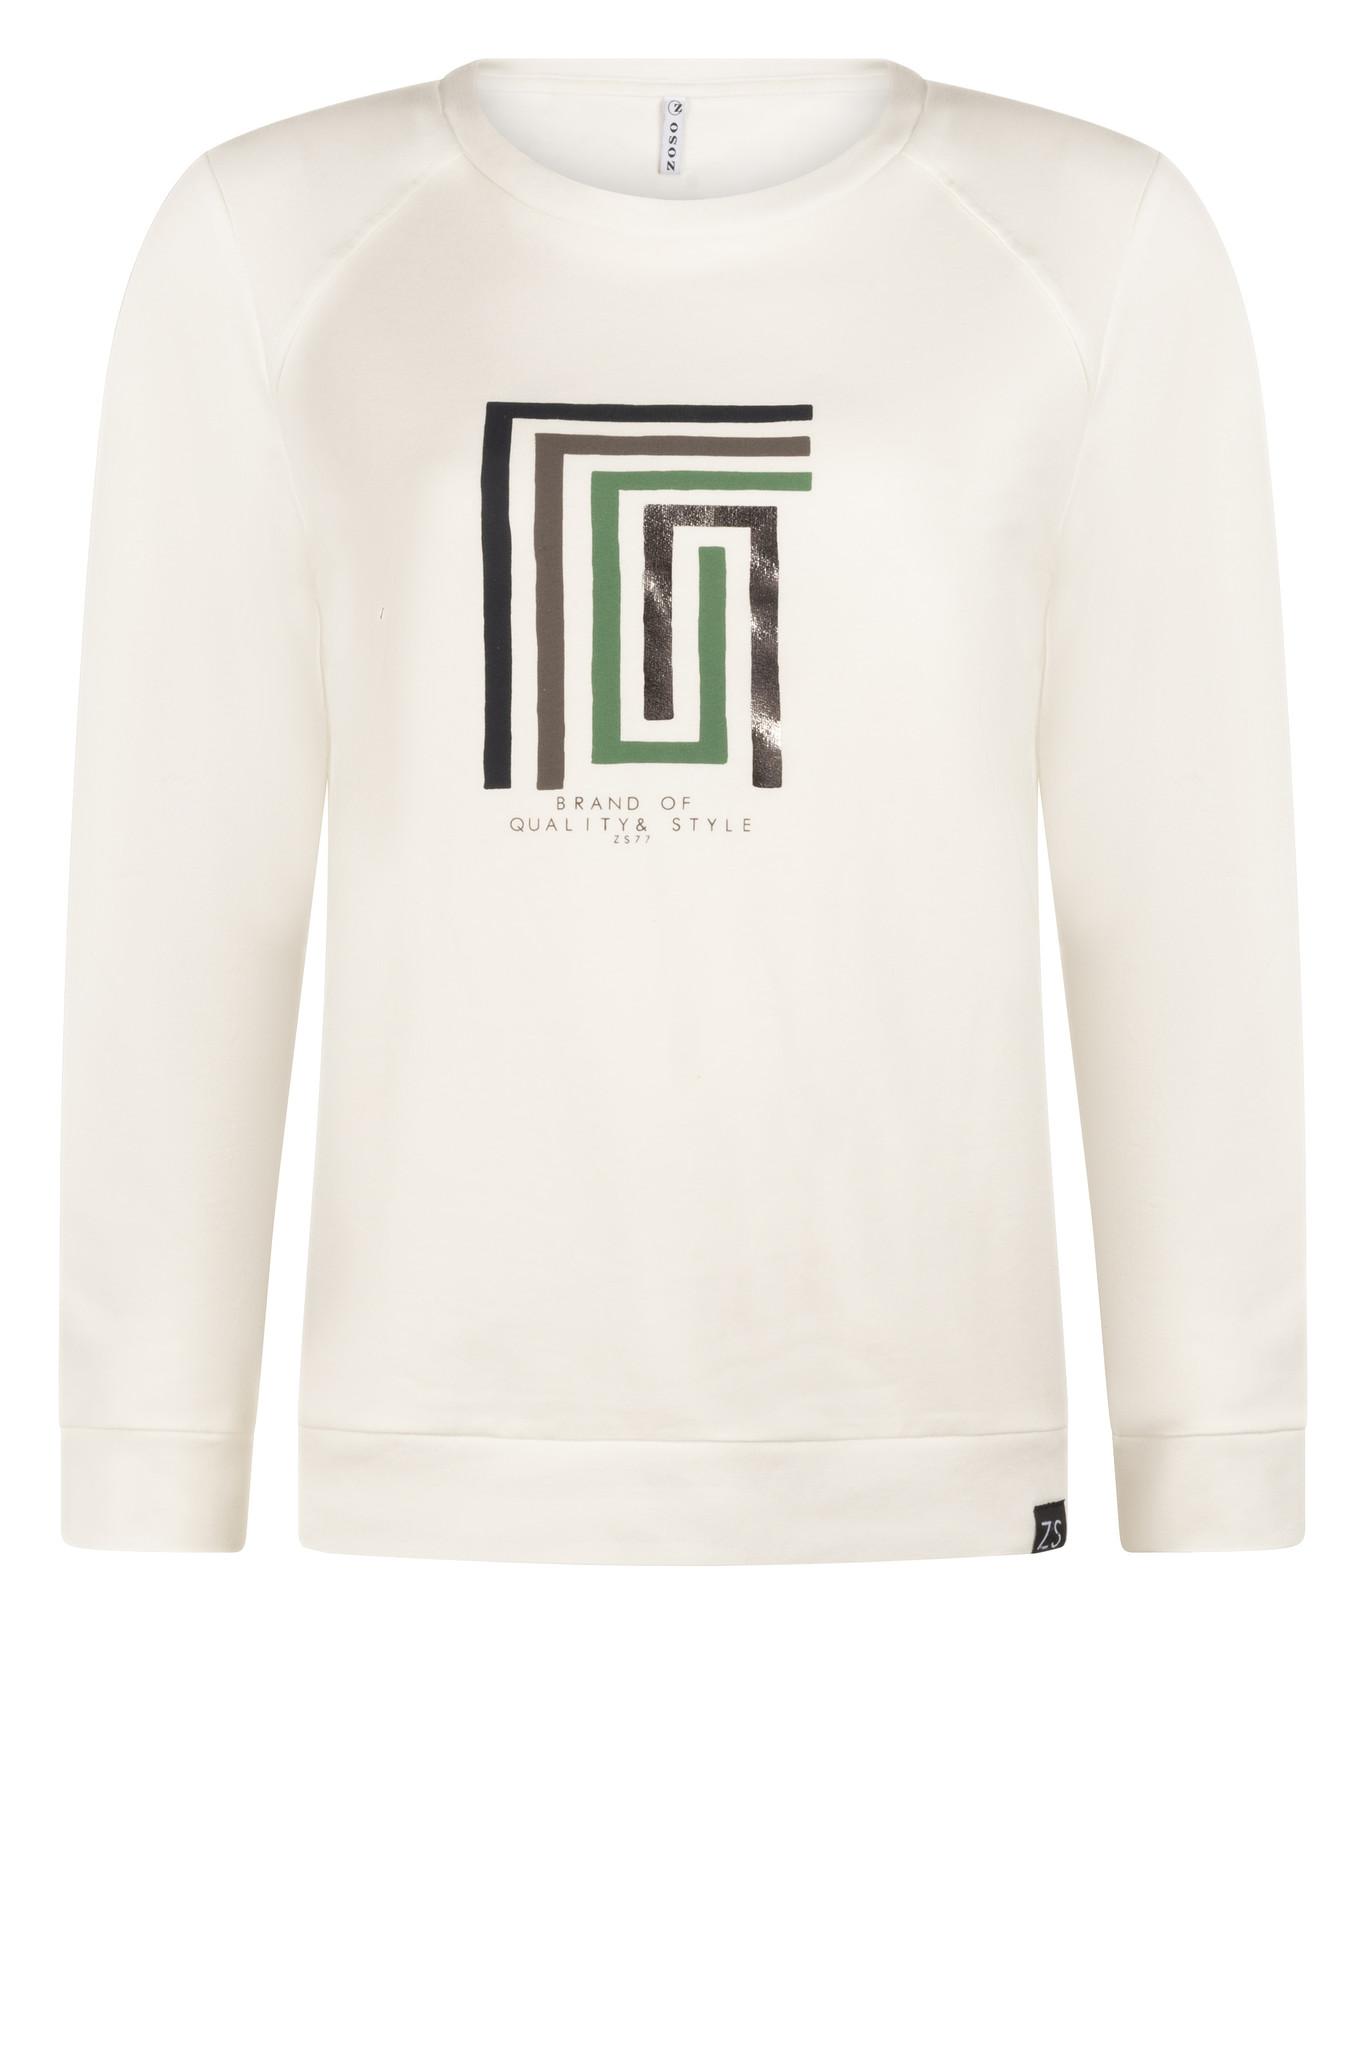 Zoso Zoso 215 Lauren Sweater with mult print  offwhite/green